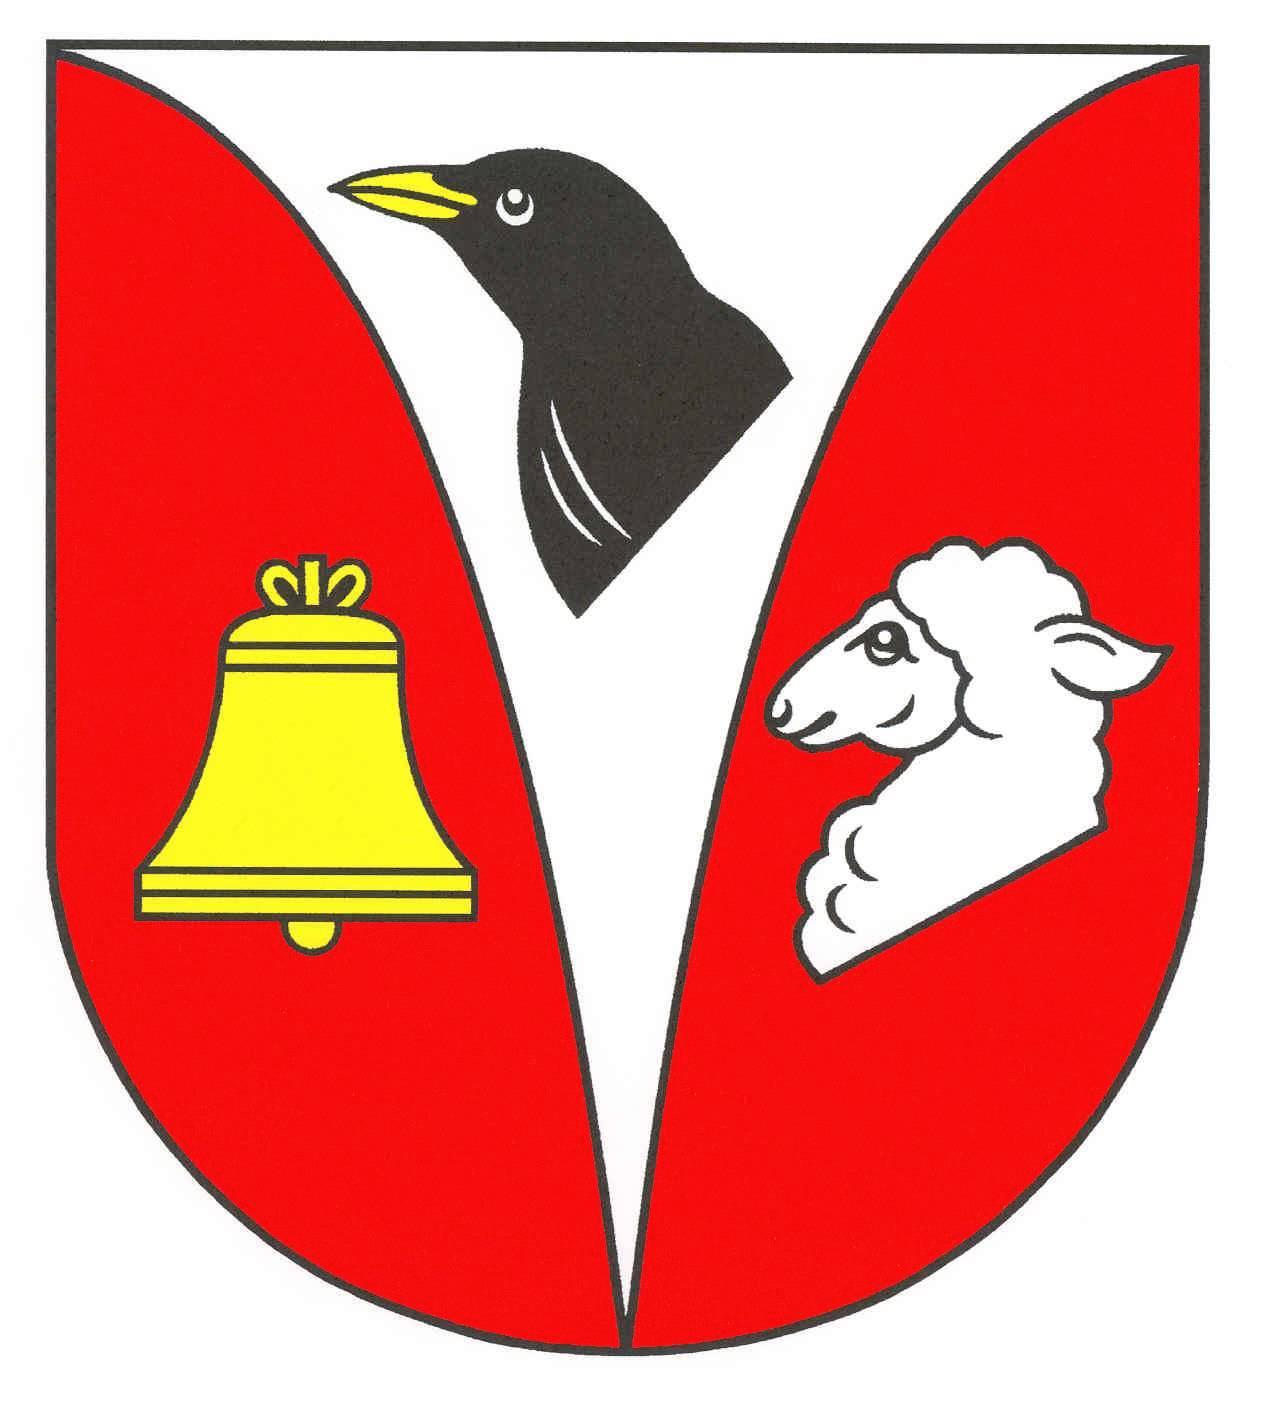 Wappen GemeindeKrukow, Kreis Herzogtum Lauenburg